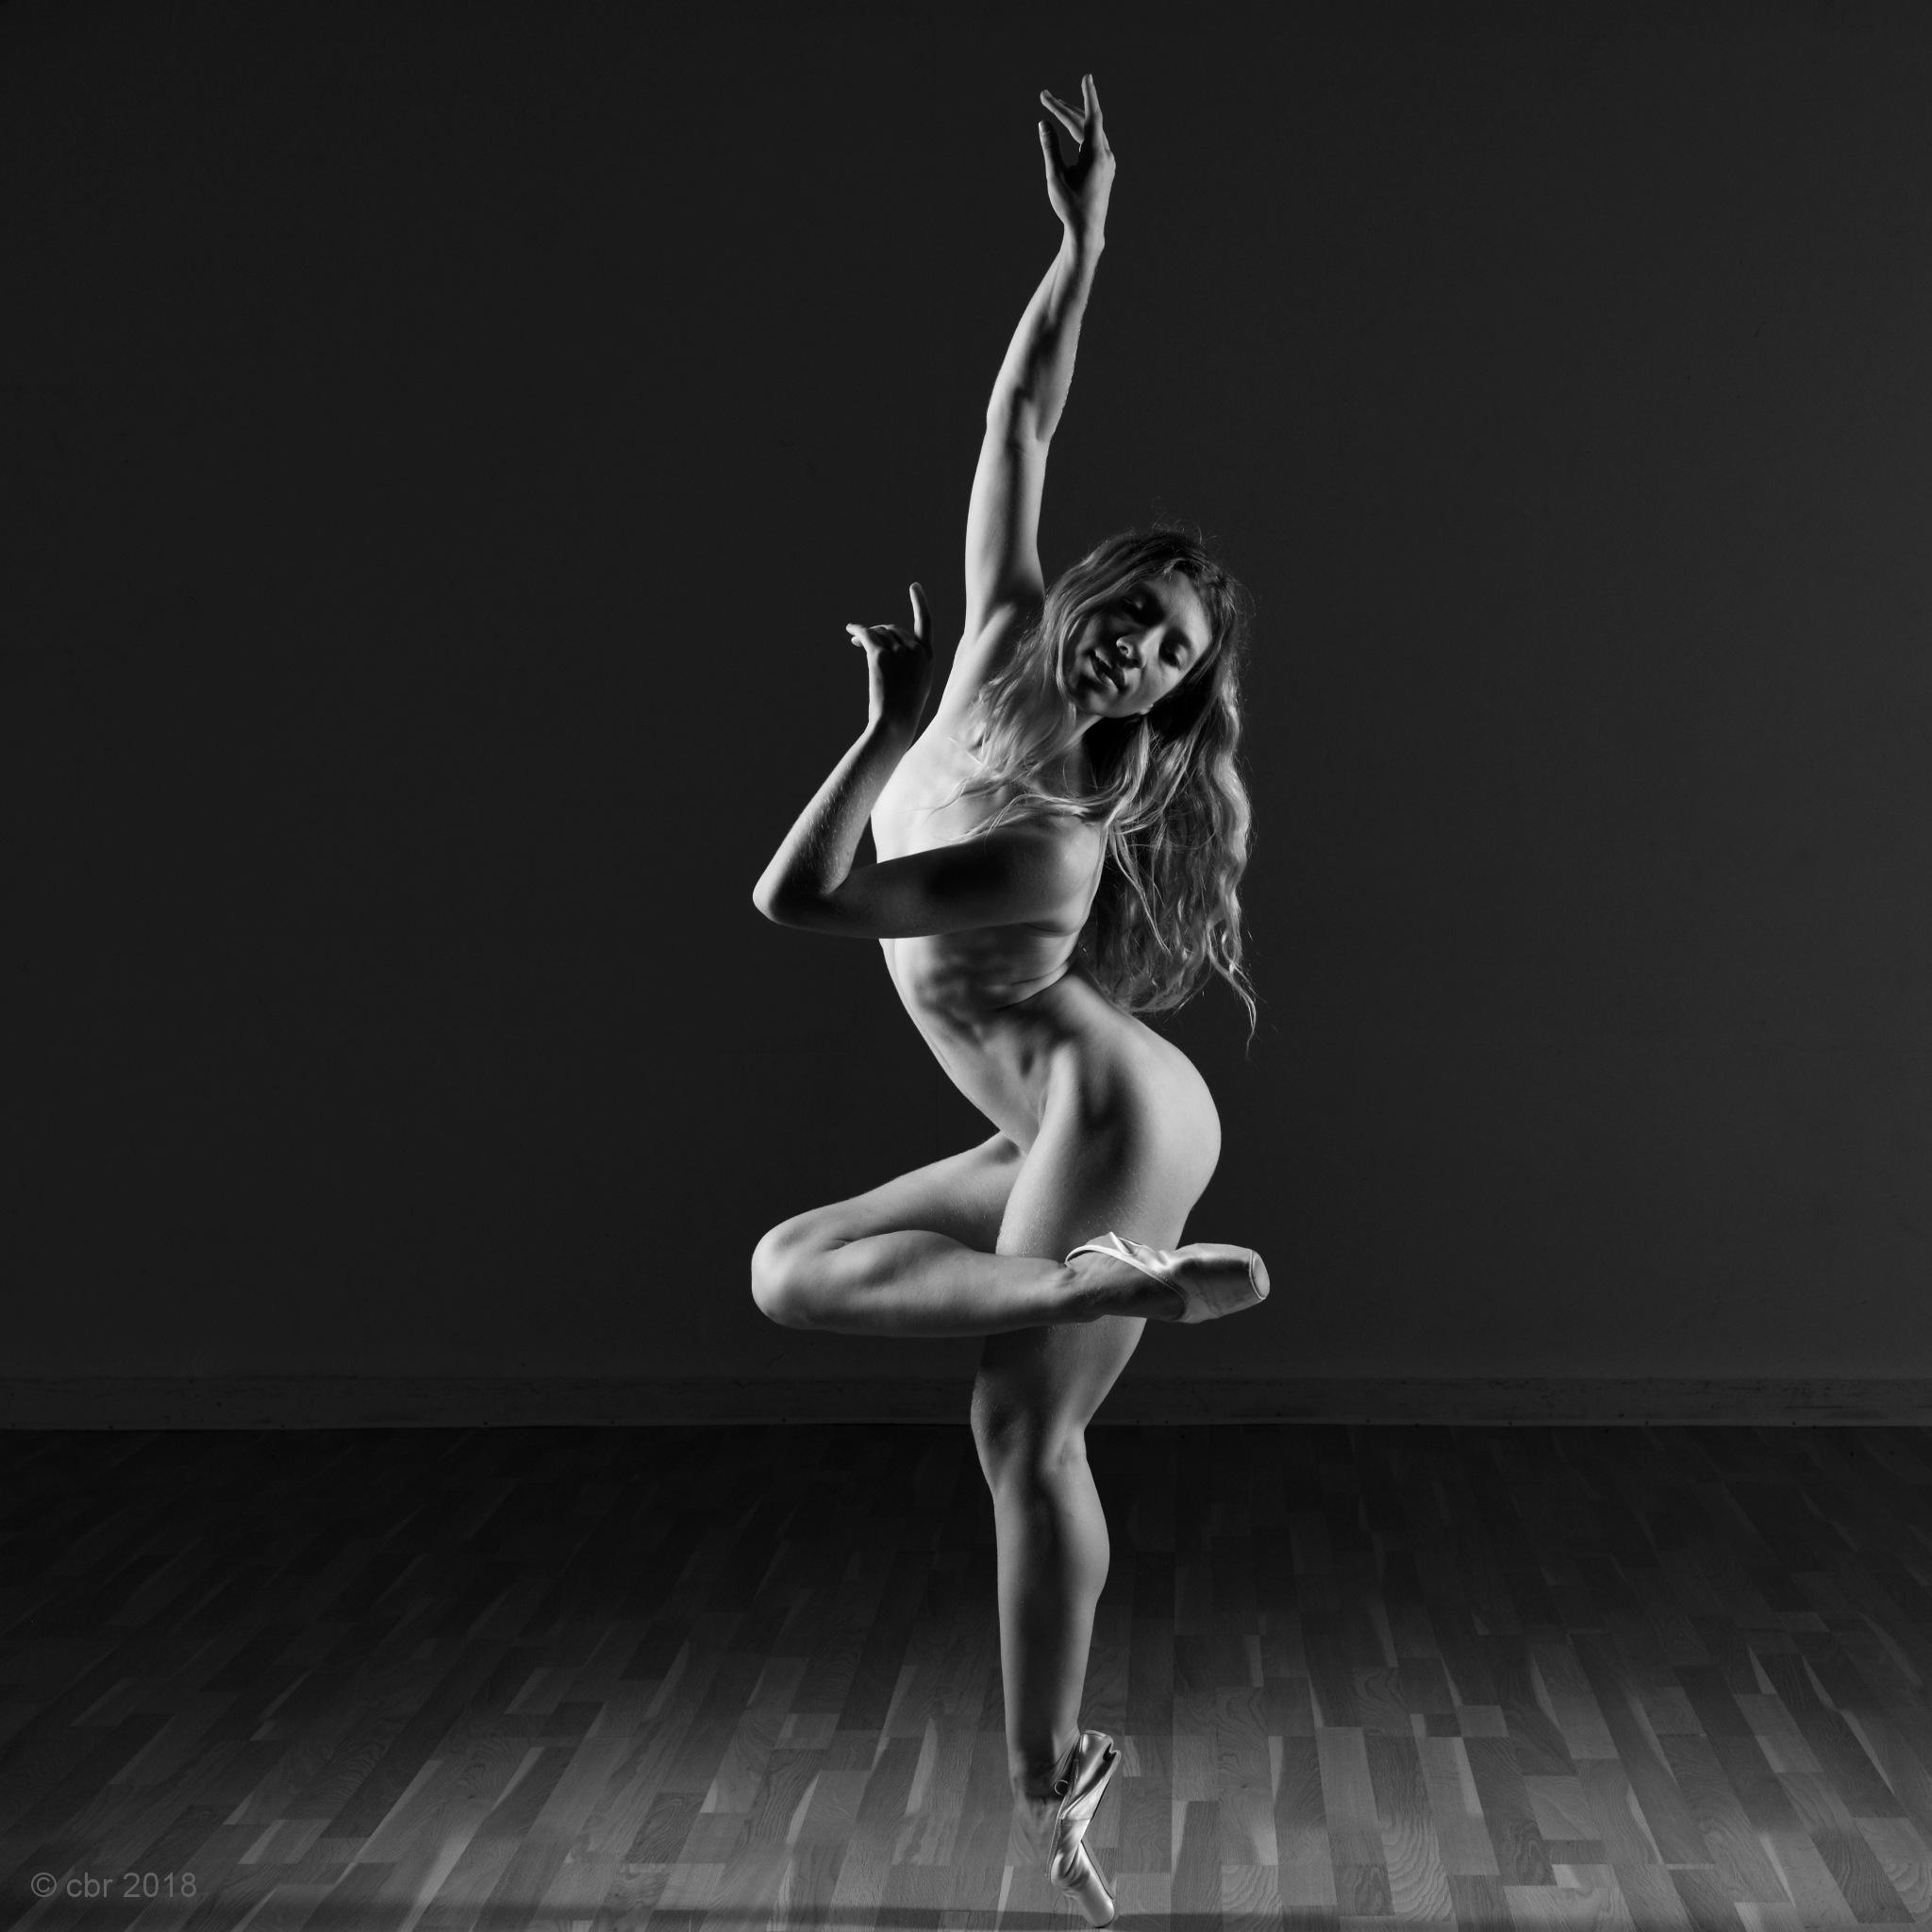 Twisting by Klas Fotografi